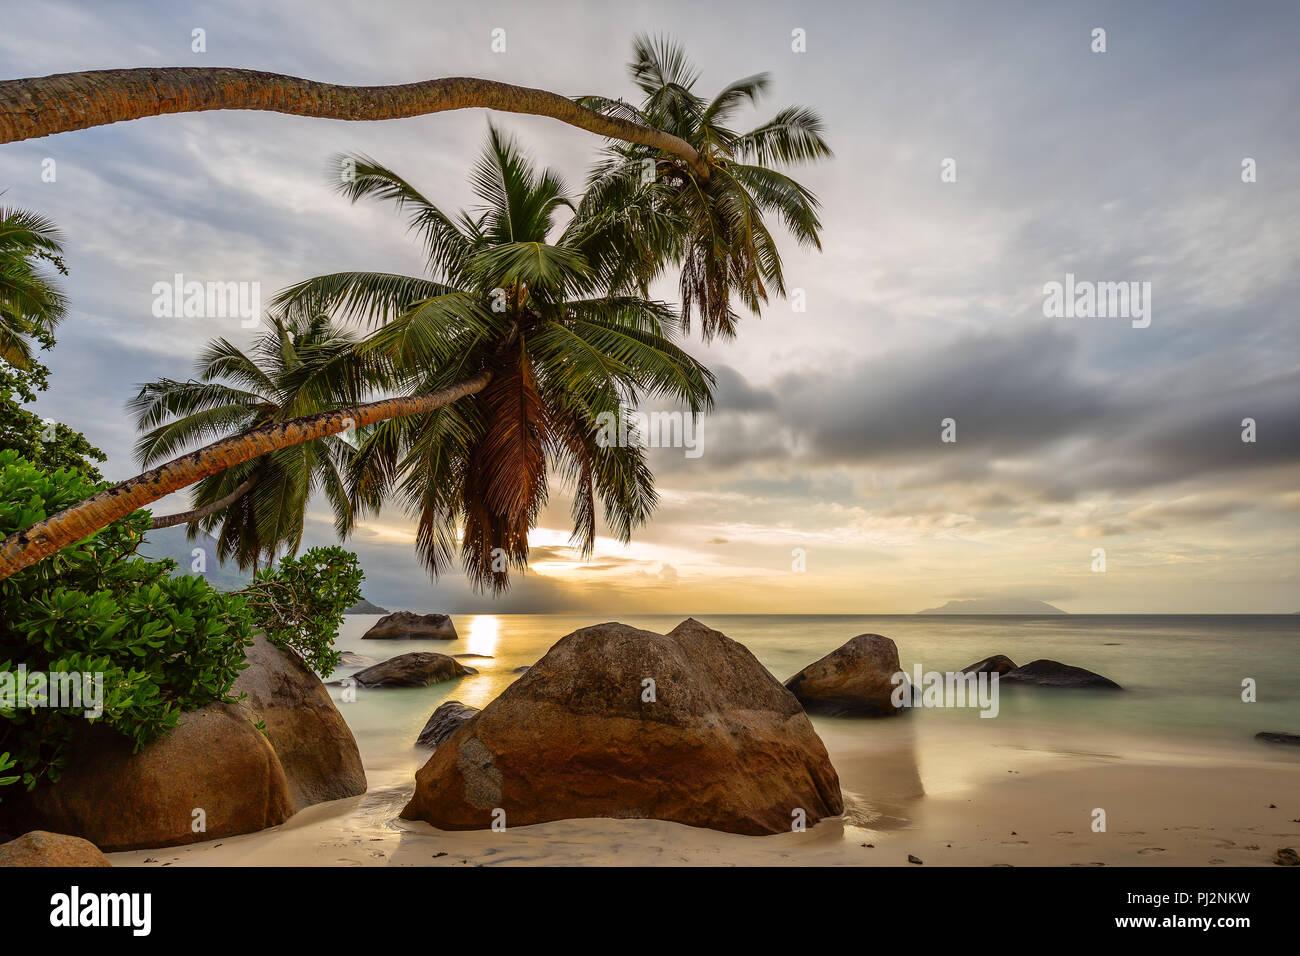 The coconut palms stretch far over the granite rocks towards the sun. Stock Photo